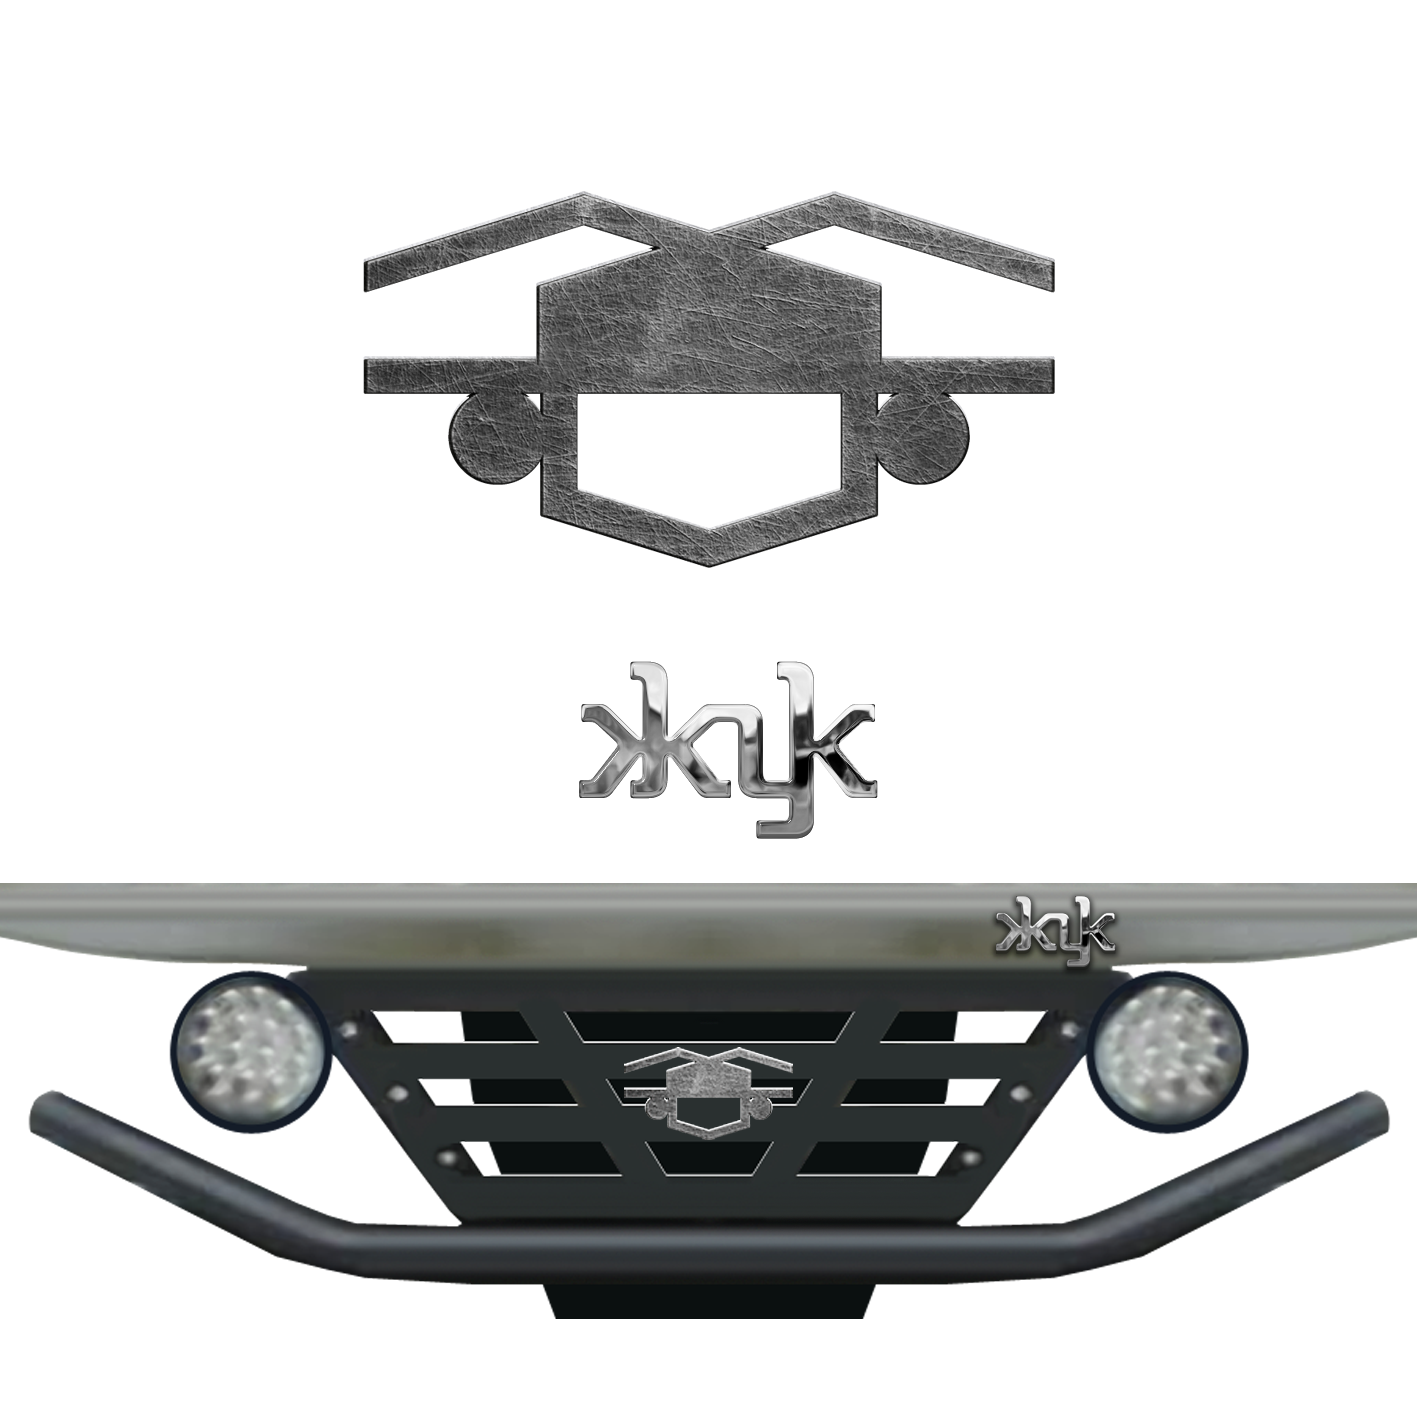 Нужен логотип (эмблема) для самодельного квадроцикла фото f_2765afd8acb44b8f.png